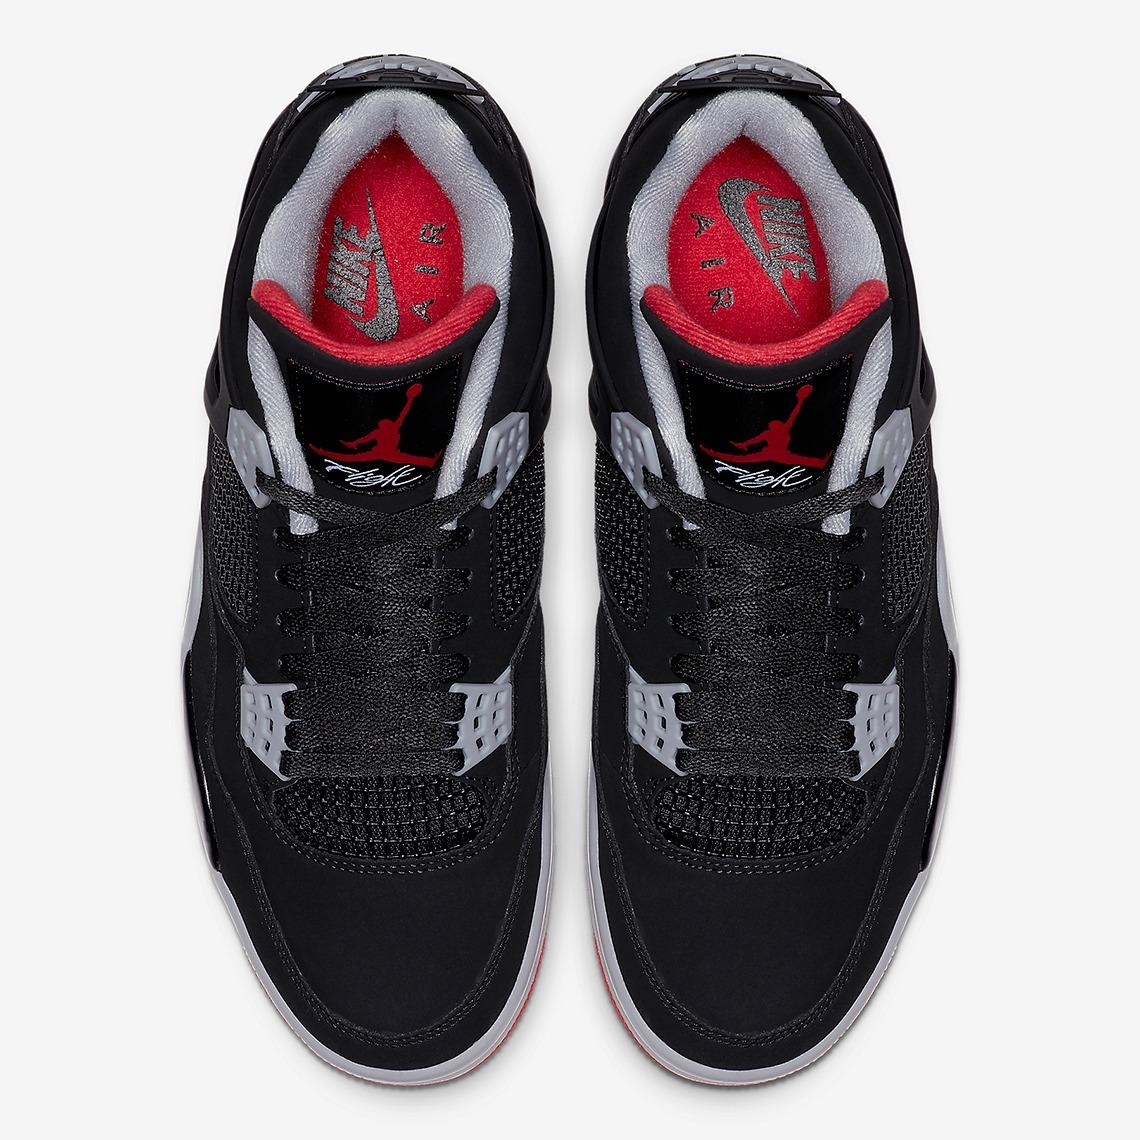 308497 060 Air Jordan 4 Bred 4